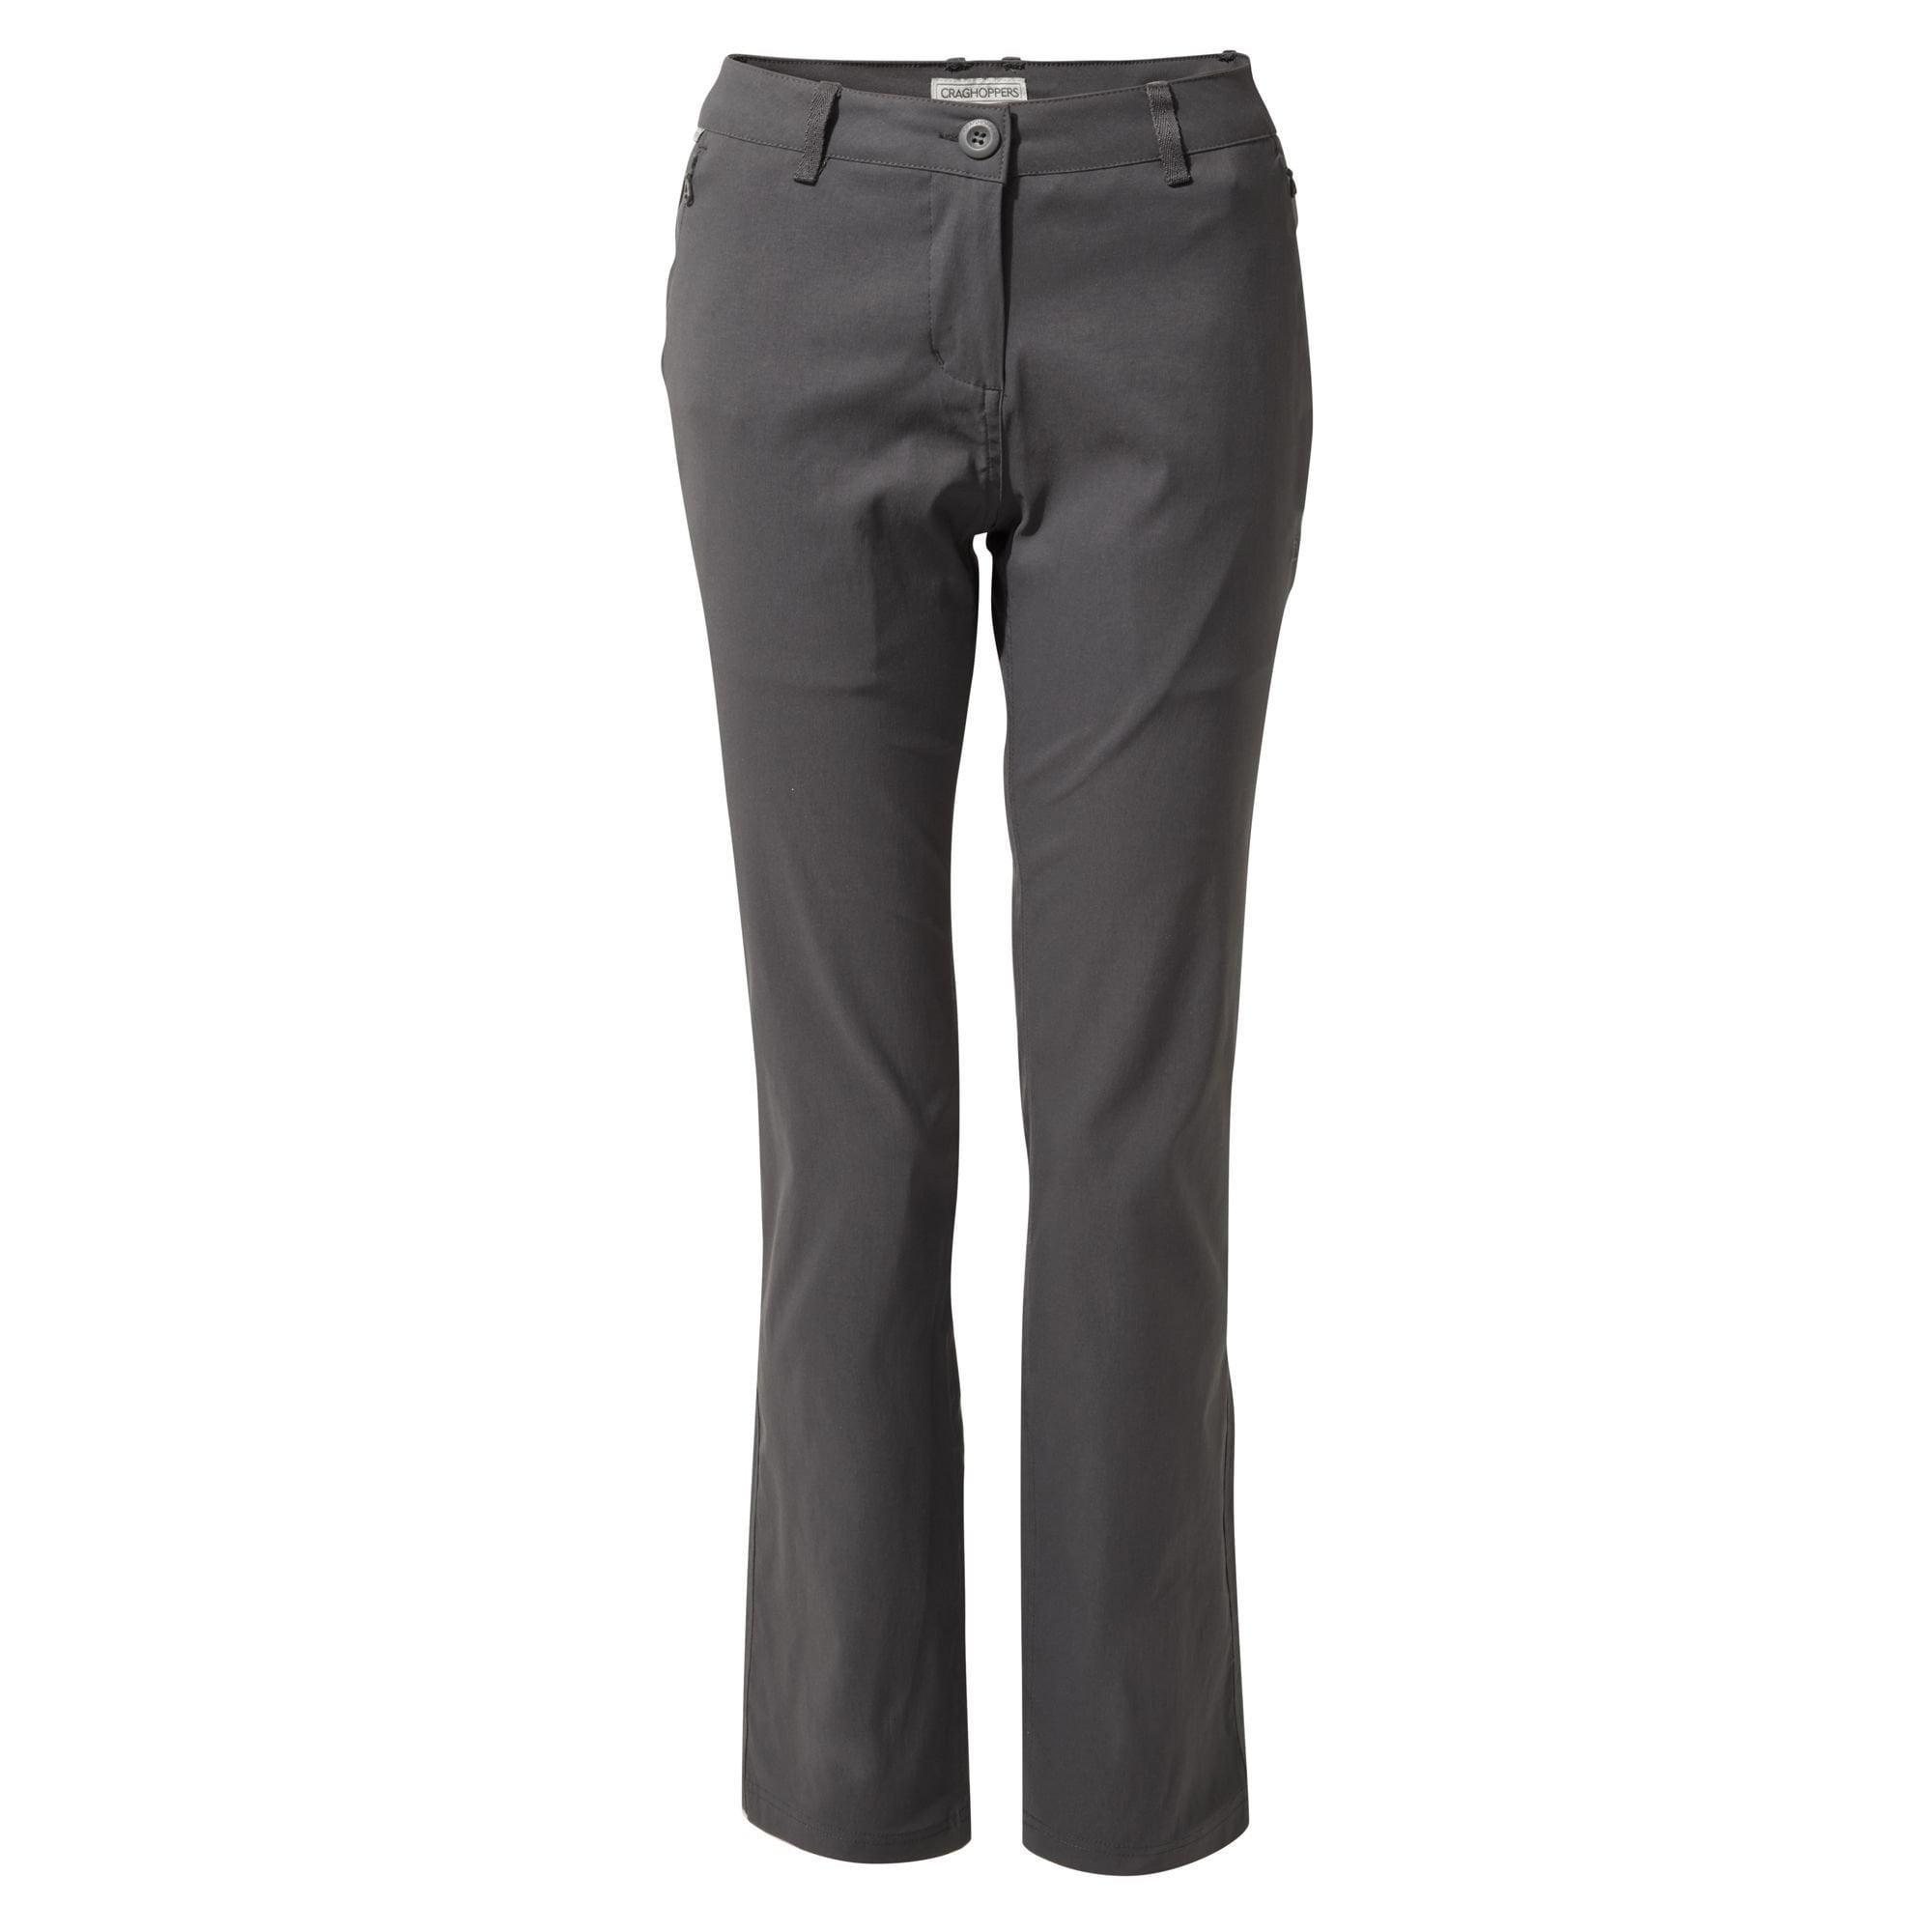 2 x Craghooppers Classic Kiwi Trousers Dark Sand Size 8R